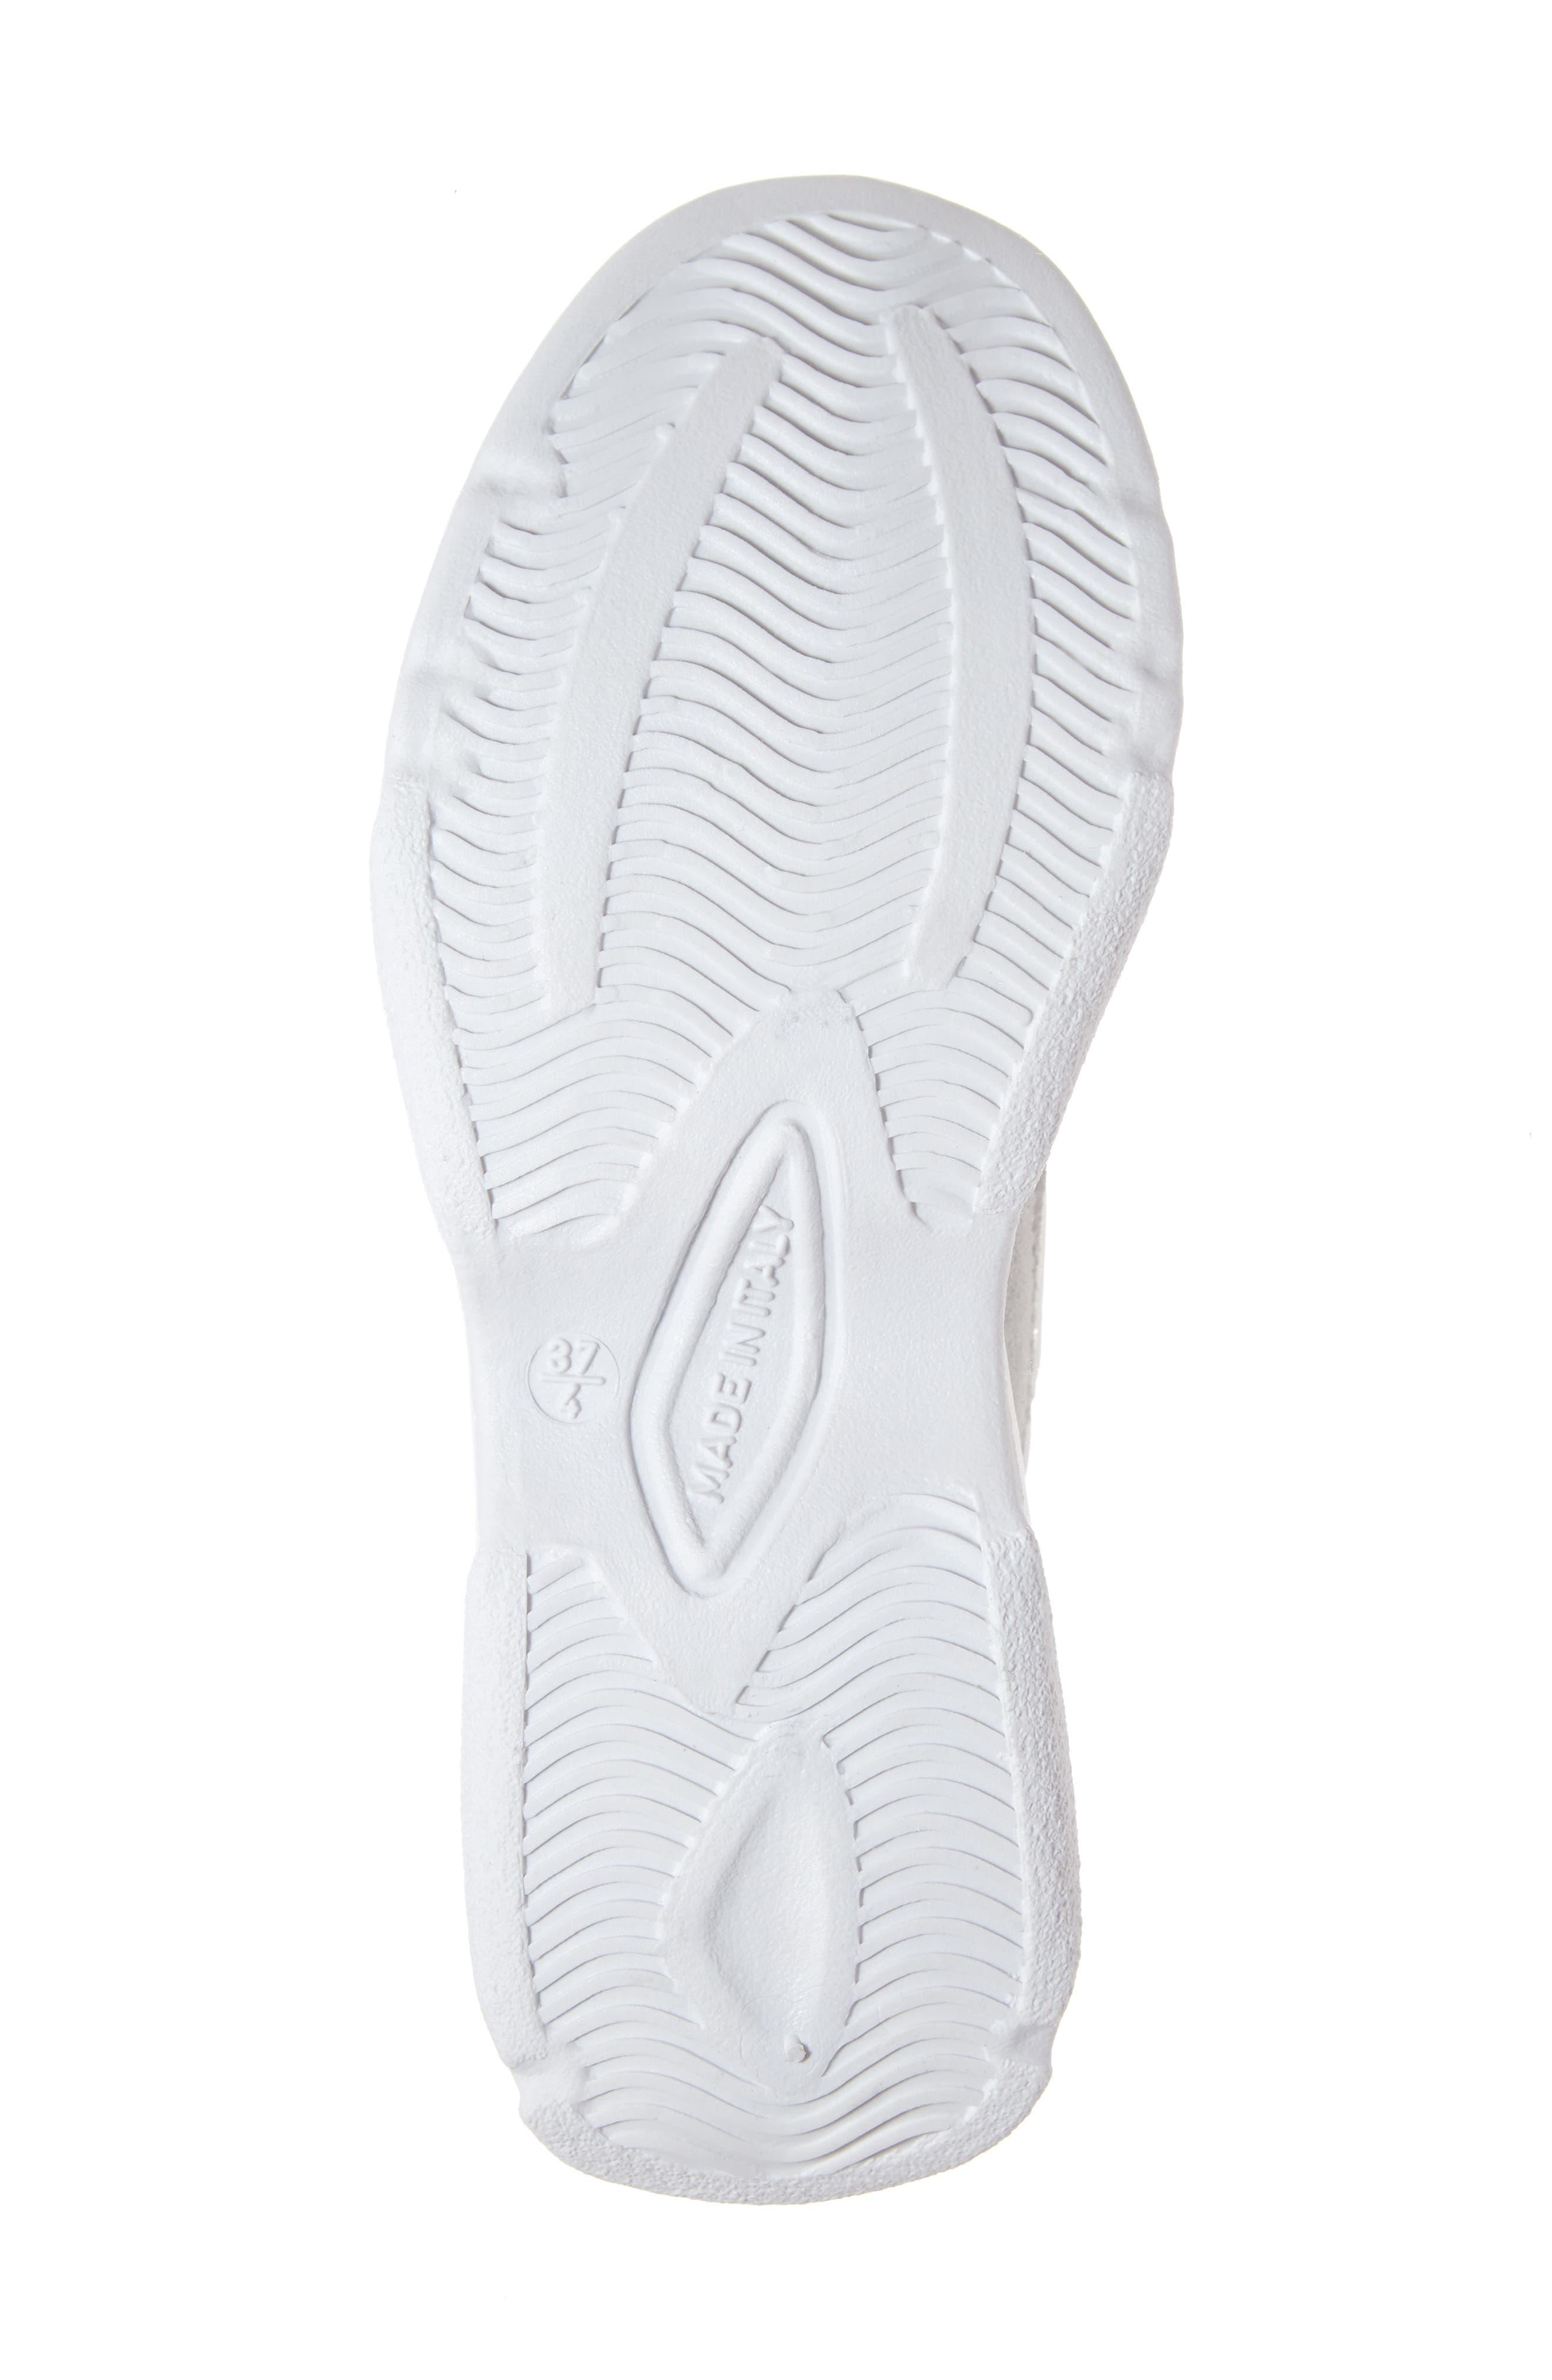 Ciara Chunky Sneaker,                             Alternate thumbnail 6, color,                             WHITE MULTI